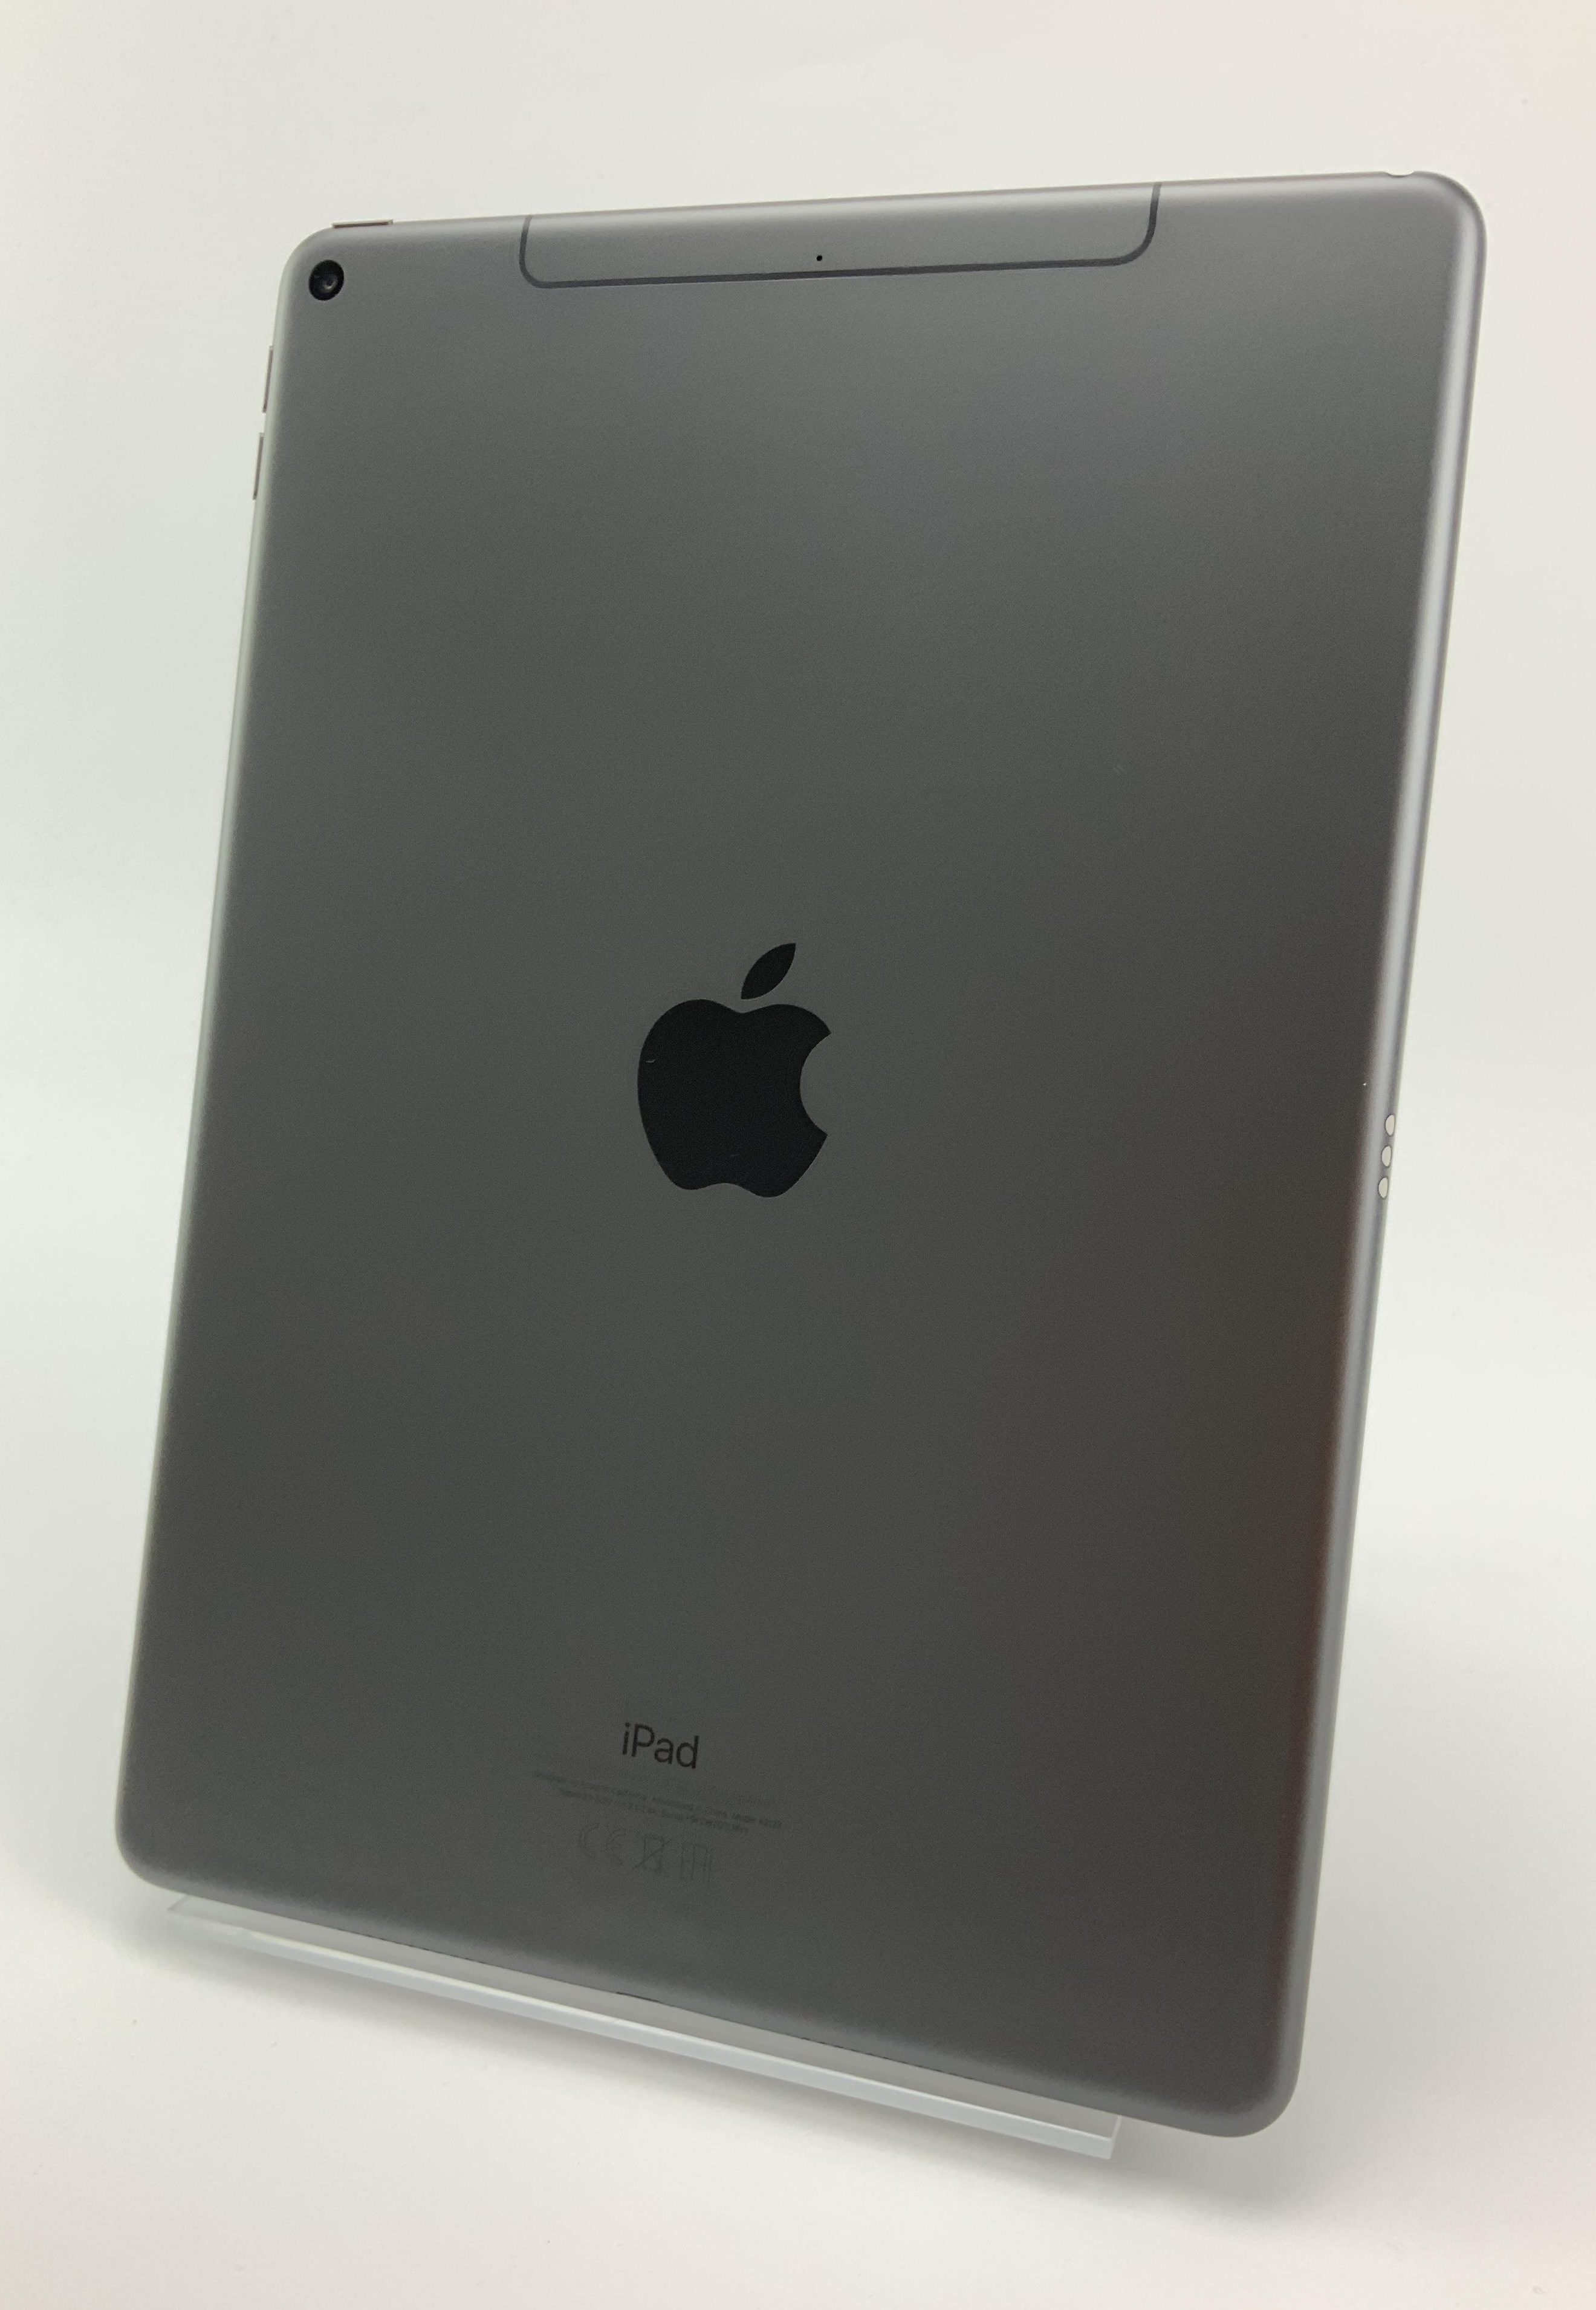 iPad Air 3 Wi-Fi + Cellular 64GB, 64GB, Space Gray, image 2